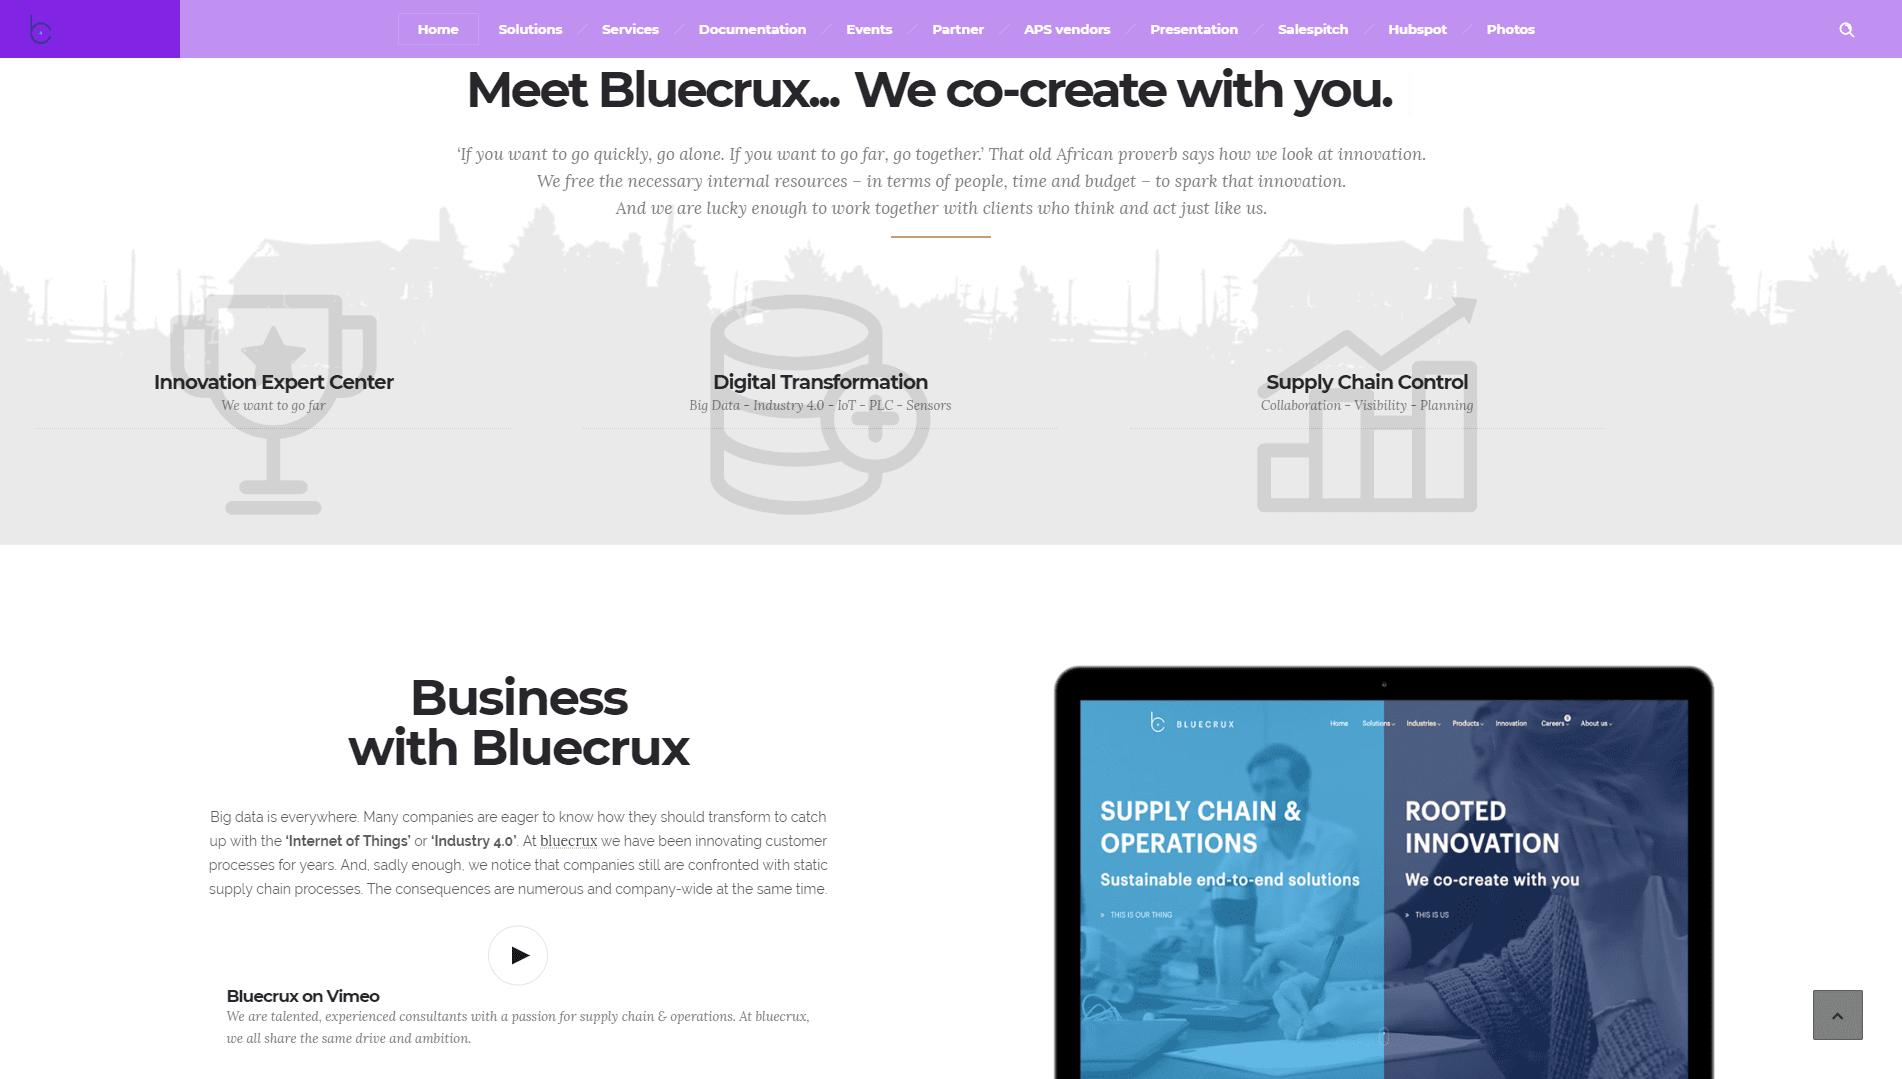 Intranet Portal Bluecrux